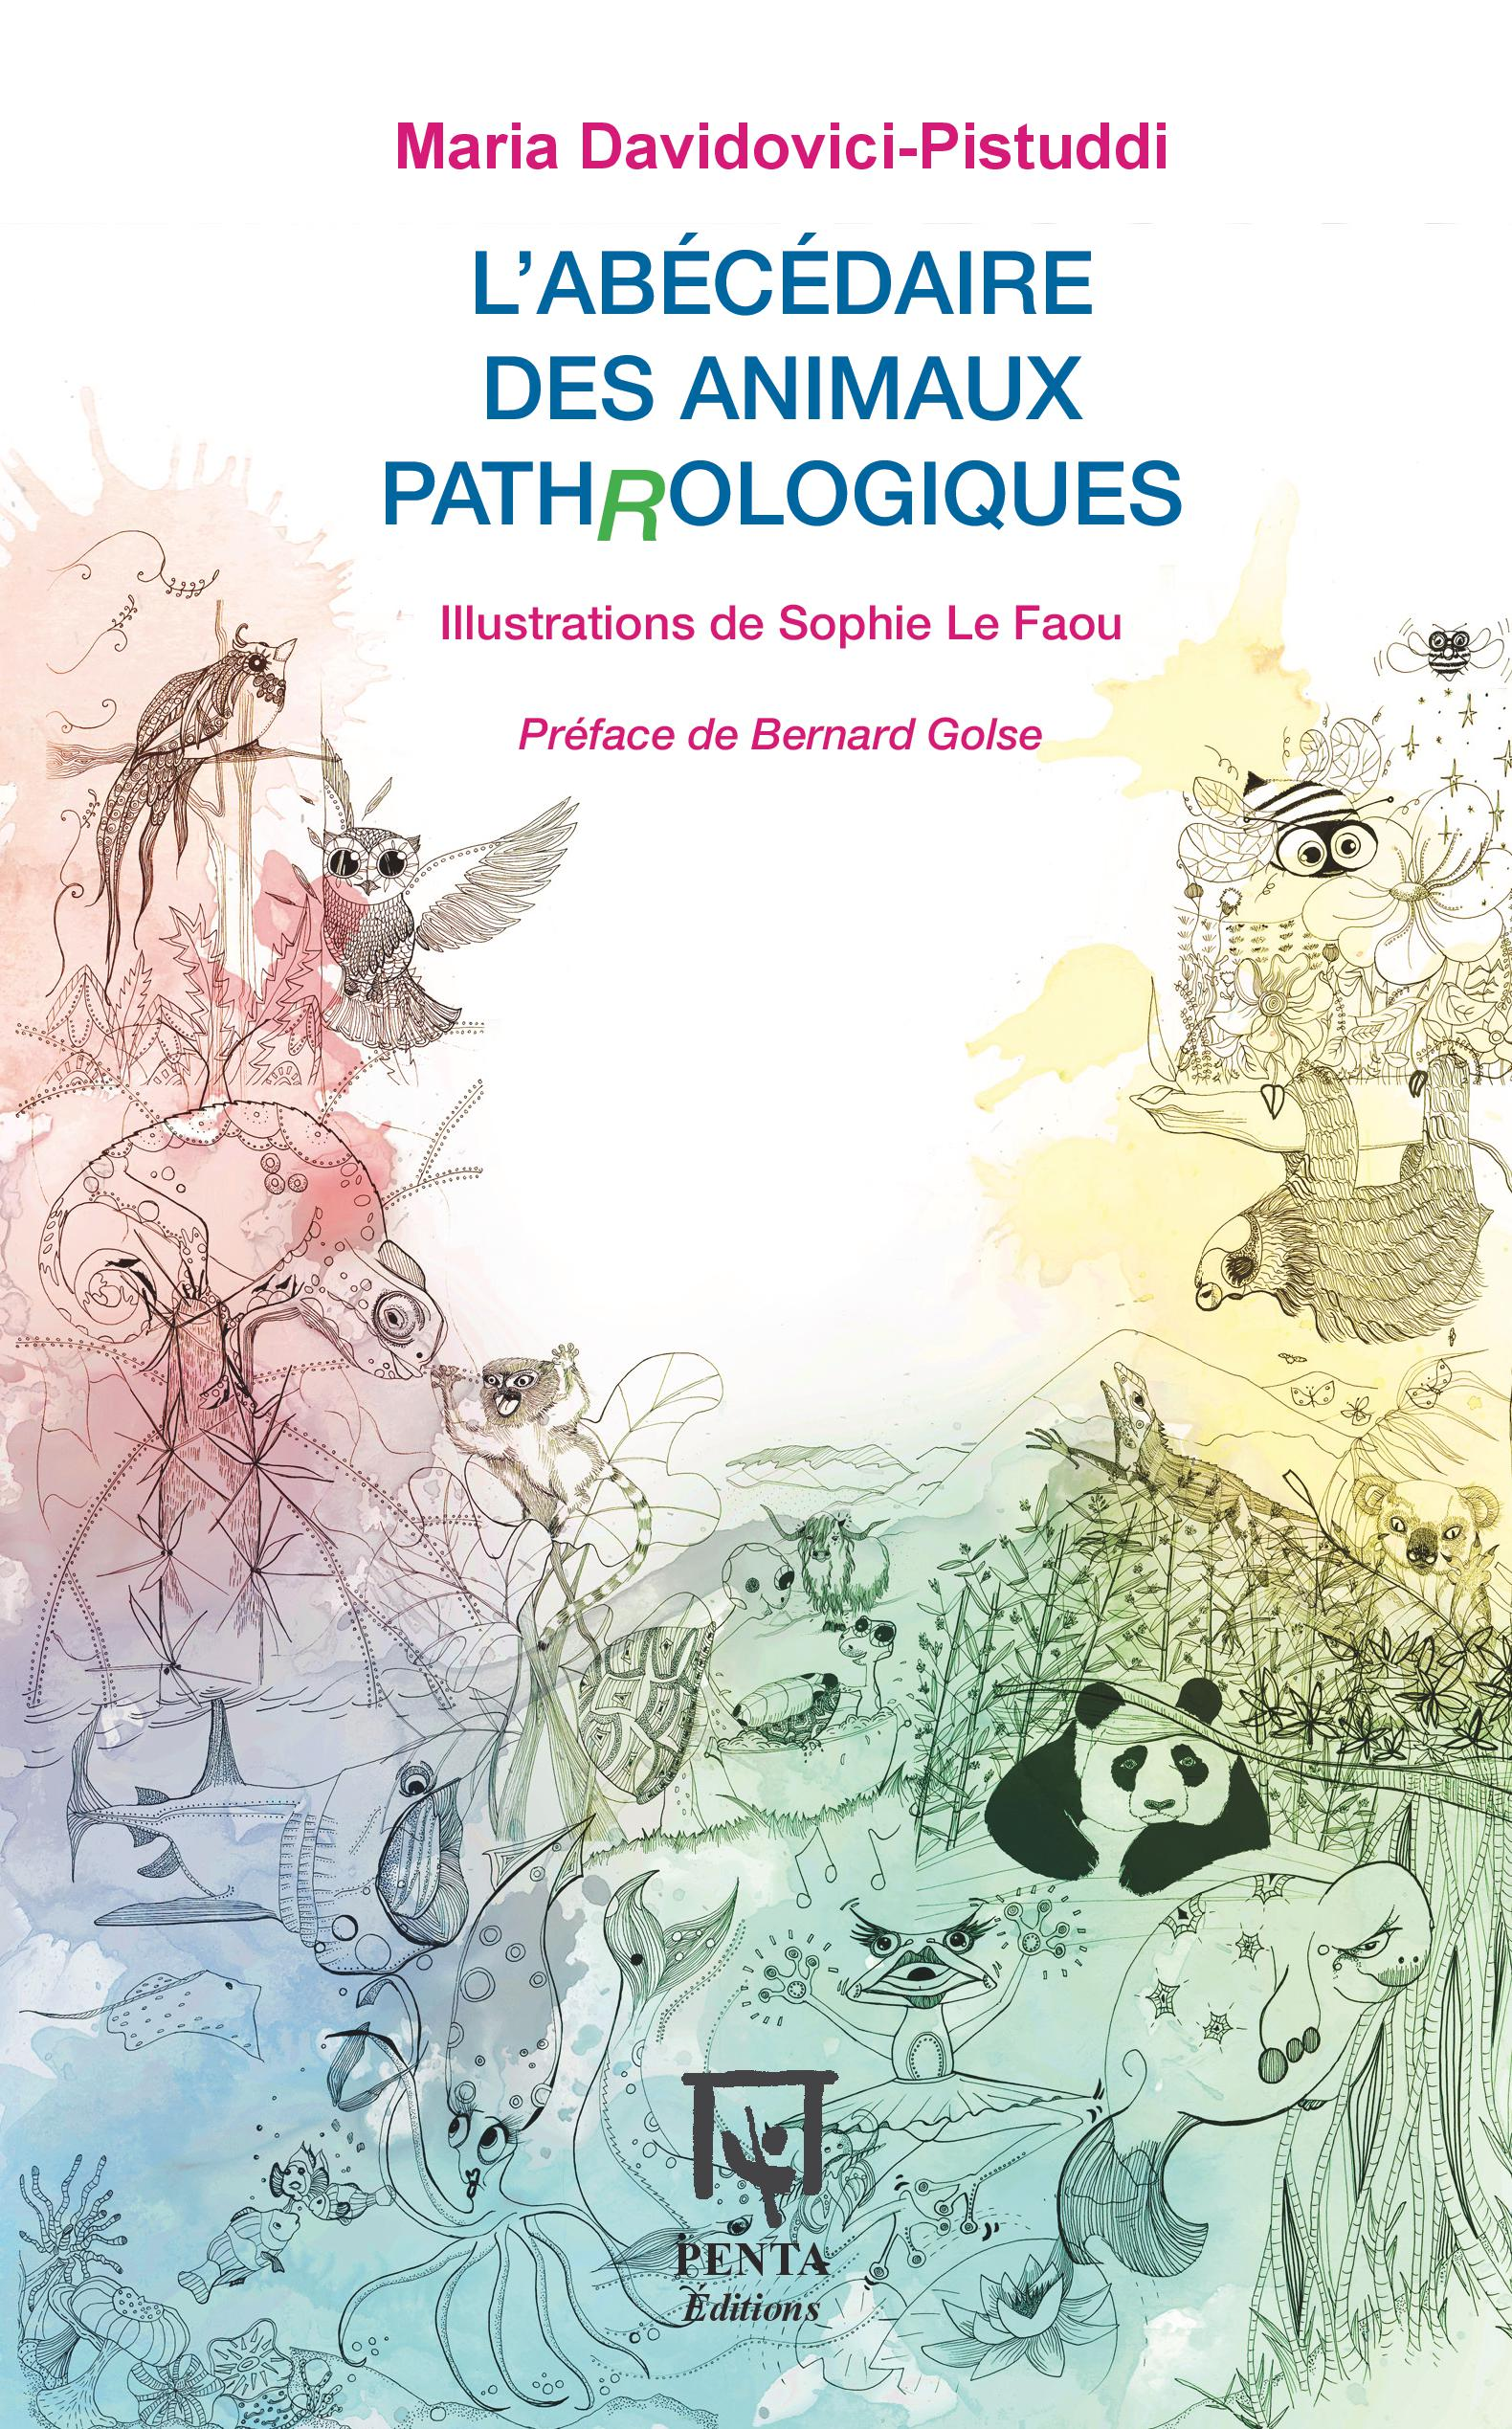 L Abecedaire Des Animaux Pathrologiques Maria Davidovici Pistuddi Livre Ebook Epub